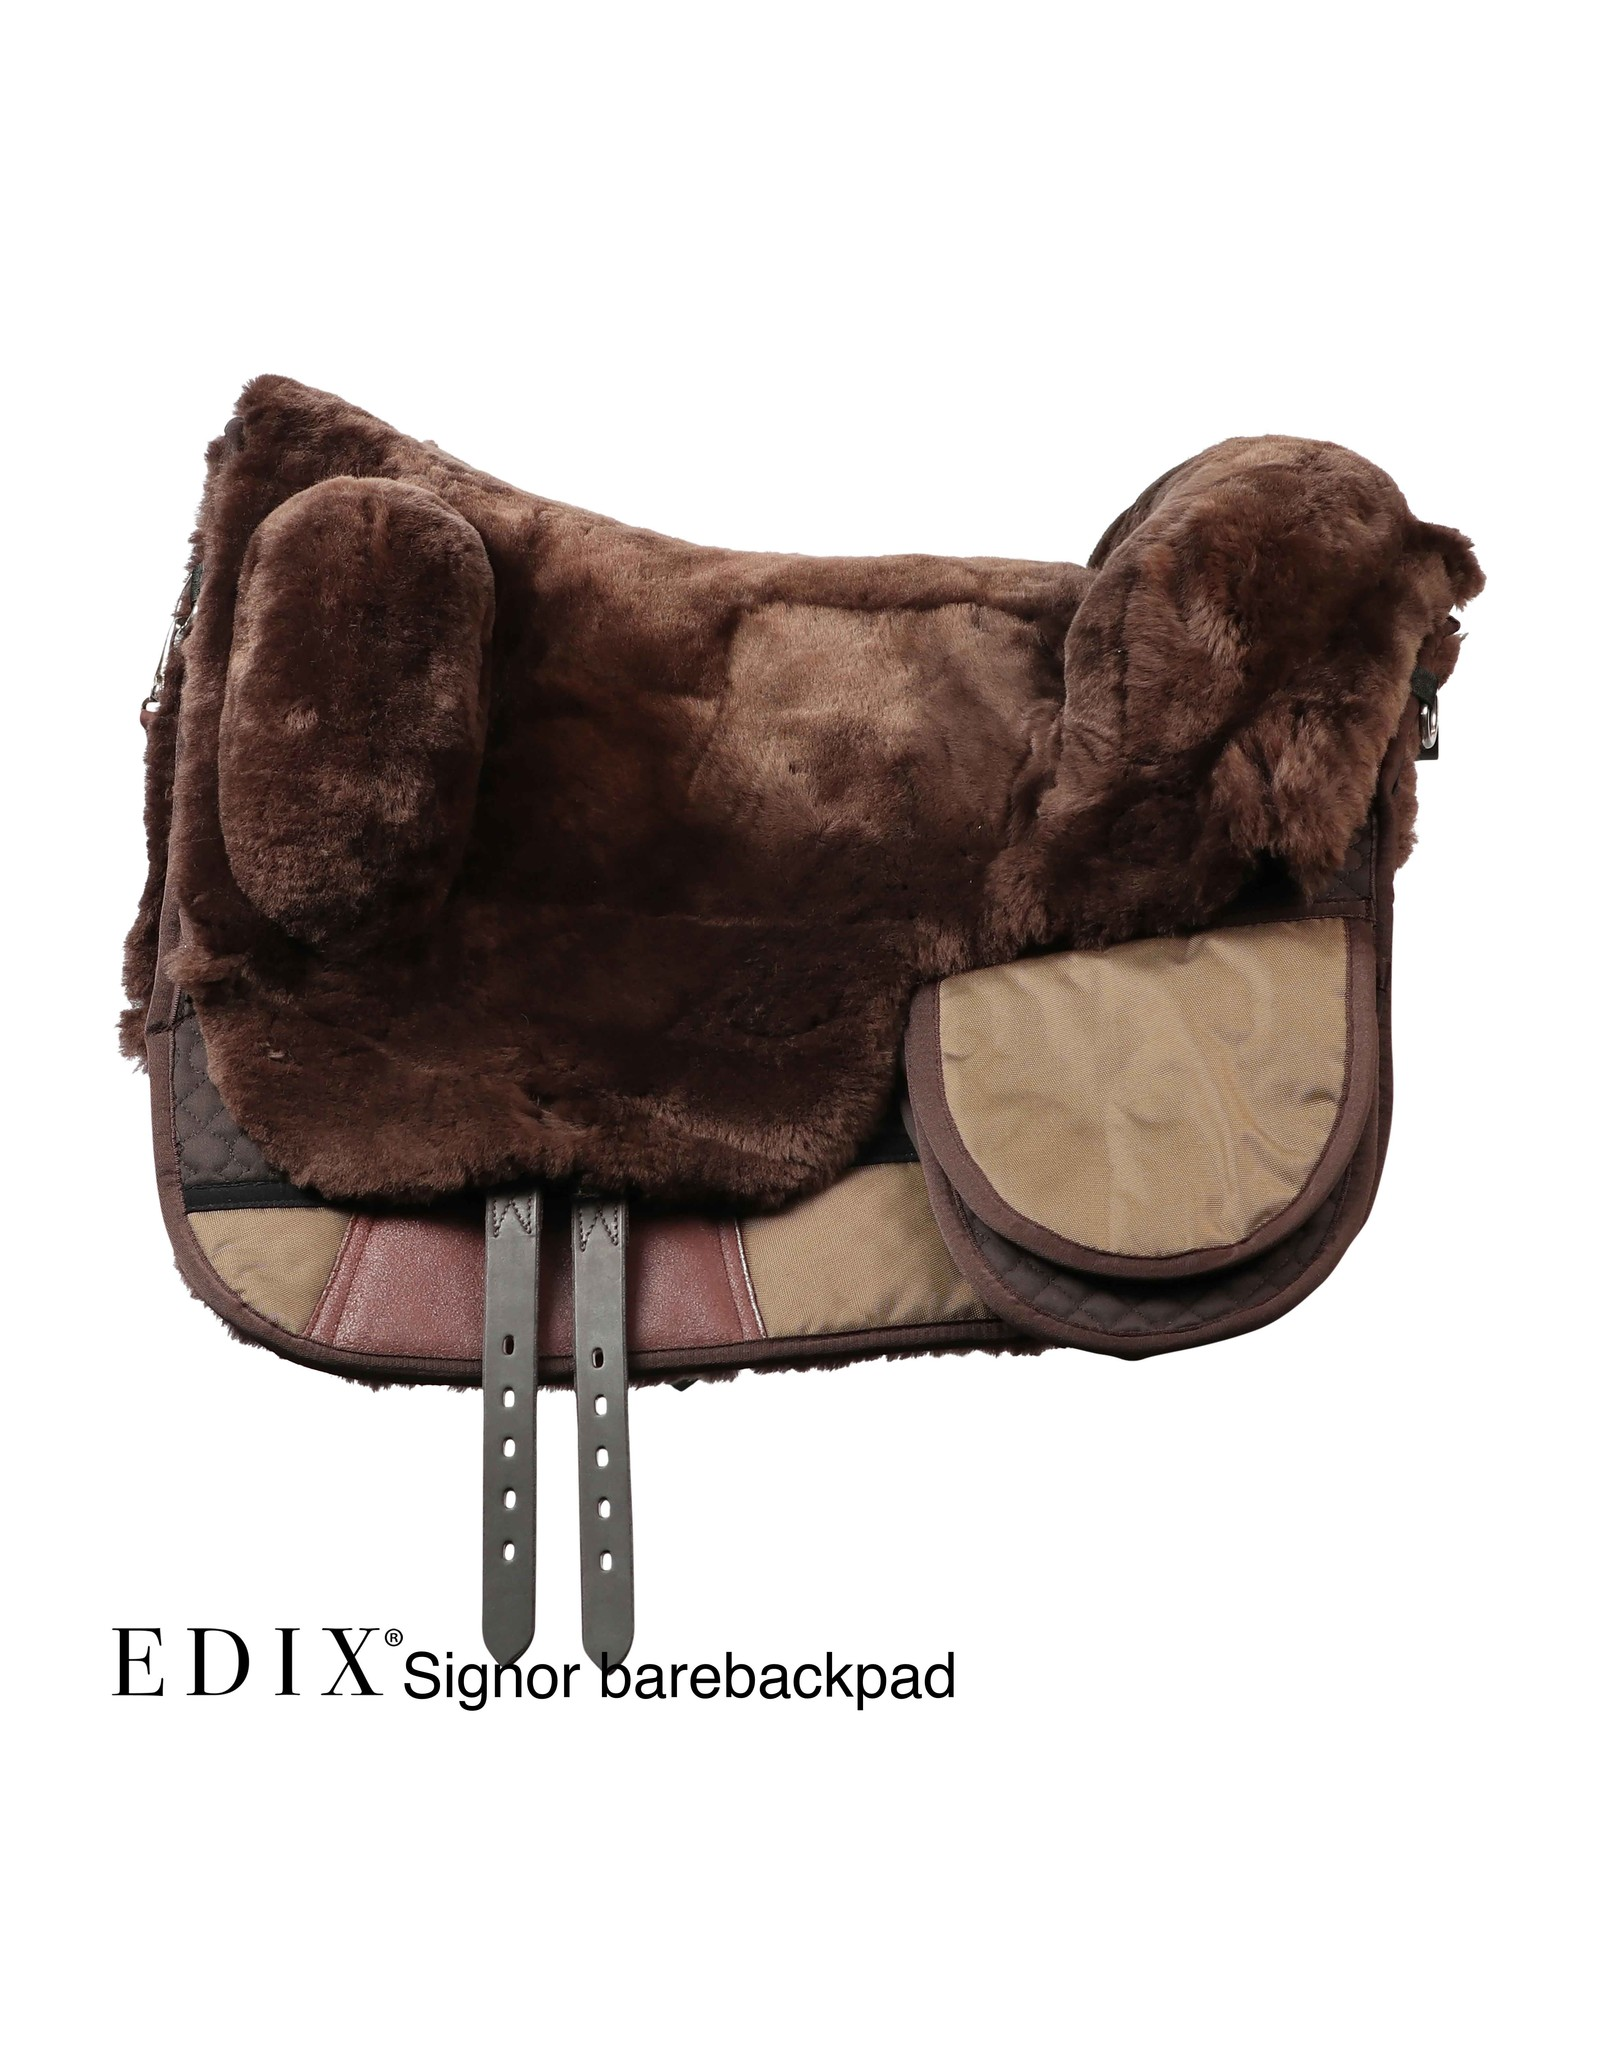 EDIX barebackpad Signor anatomisch